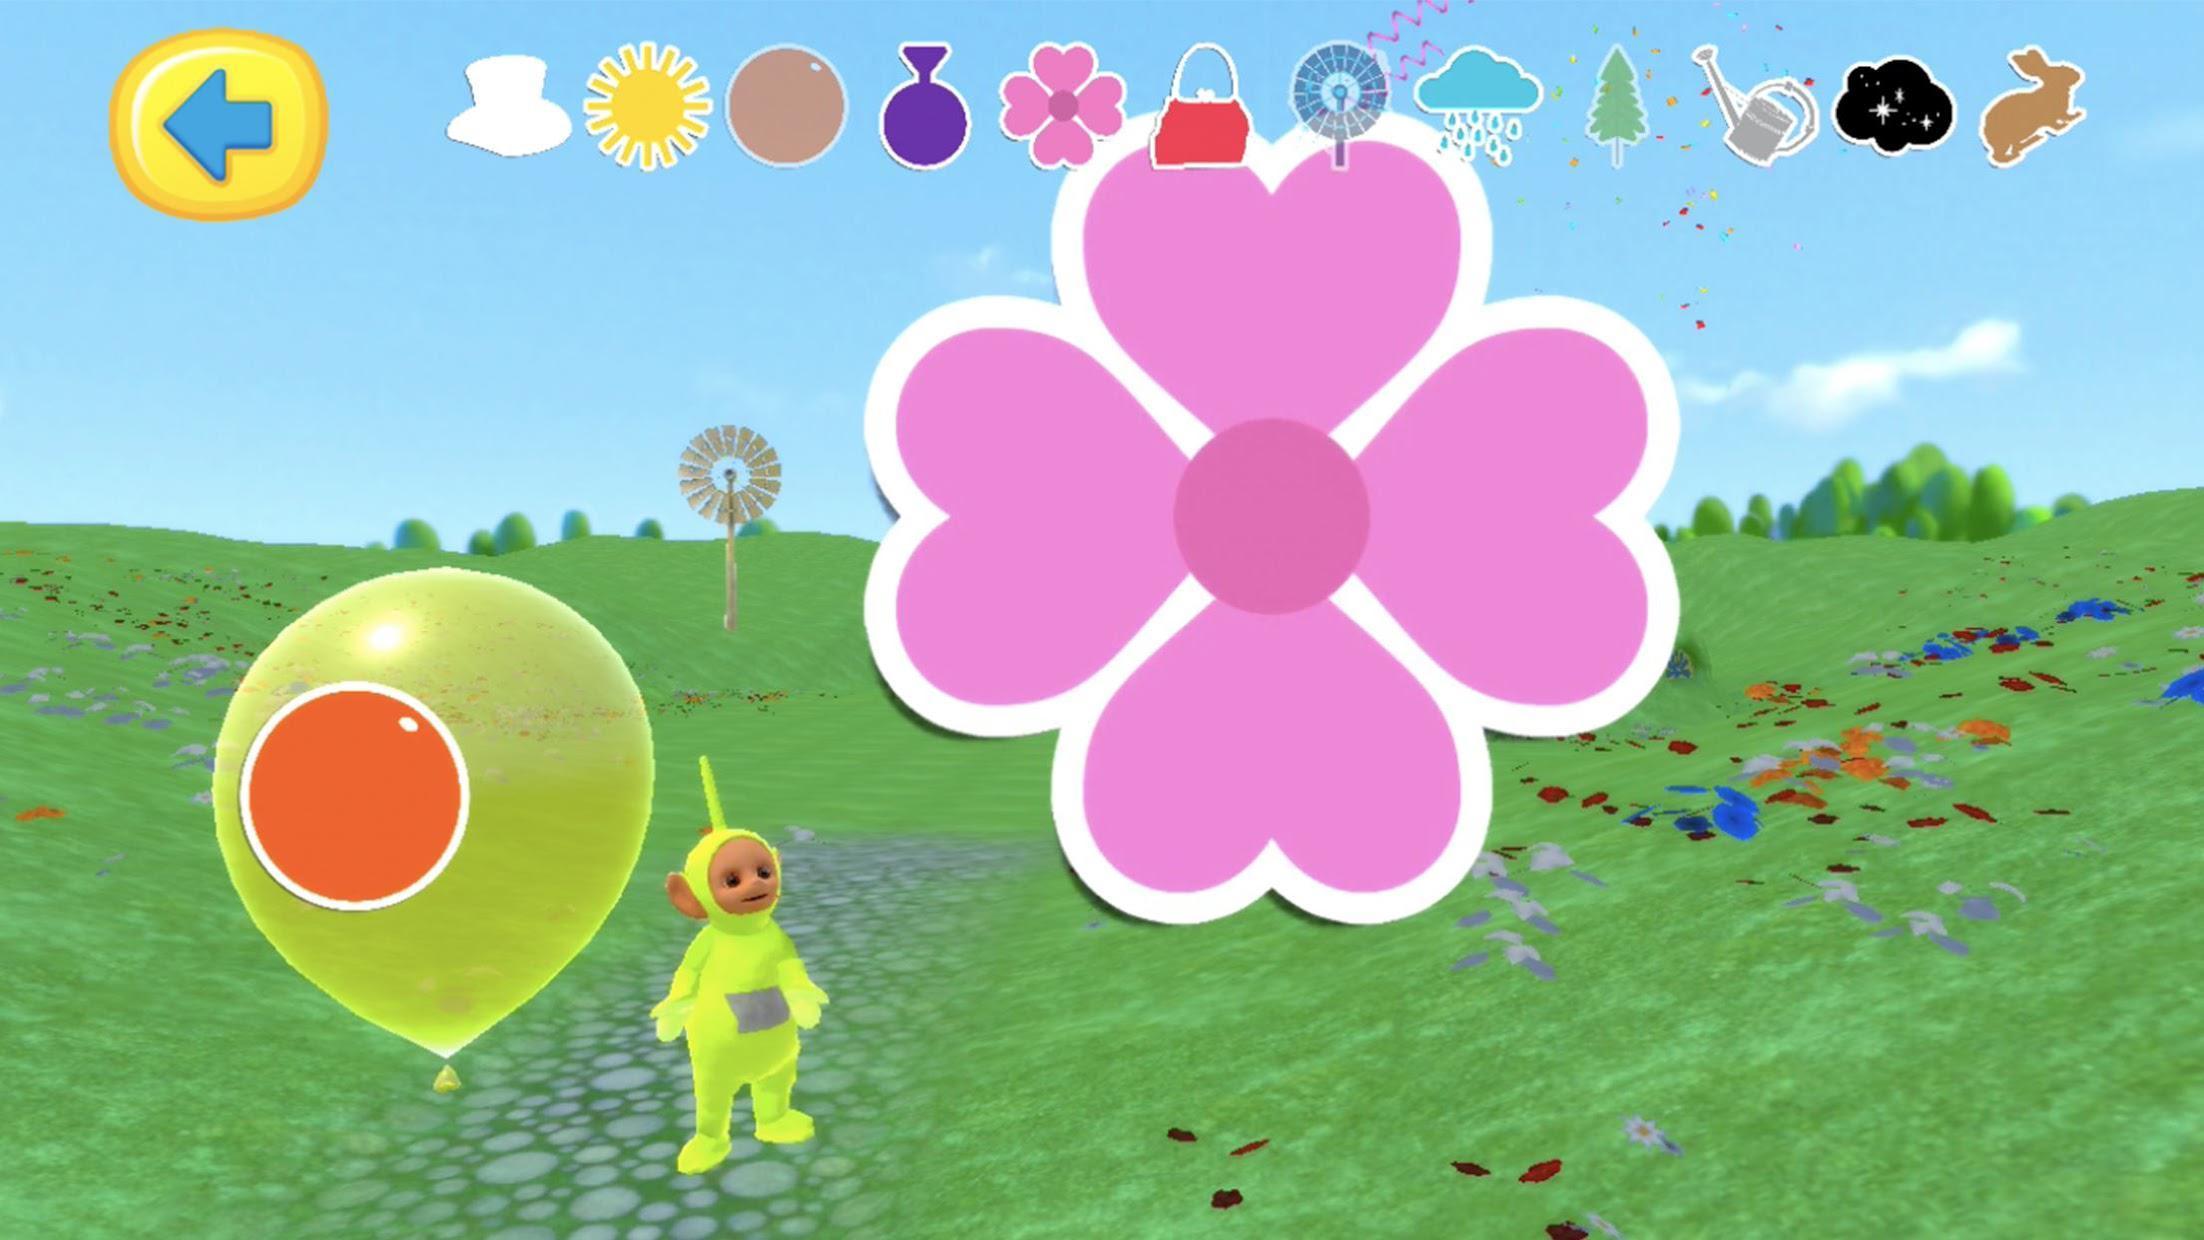 Teletubbies Balloon Pop Game For Kids 游戏截图4